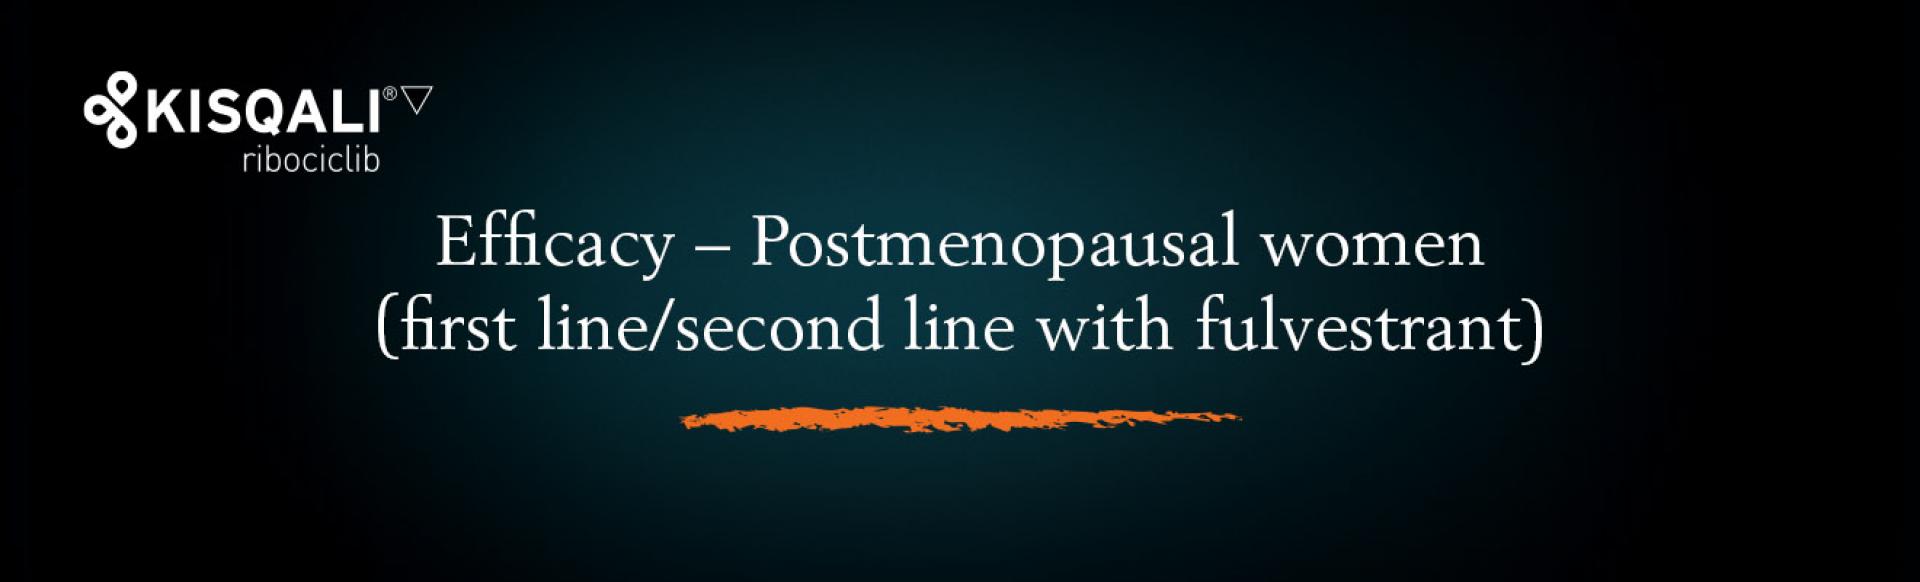 Top banner. Efficacy − Postmenopausal women (first line/second line)